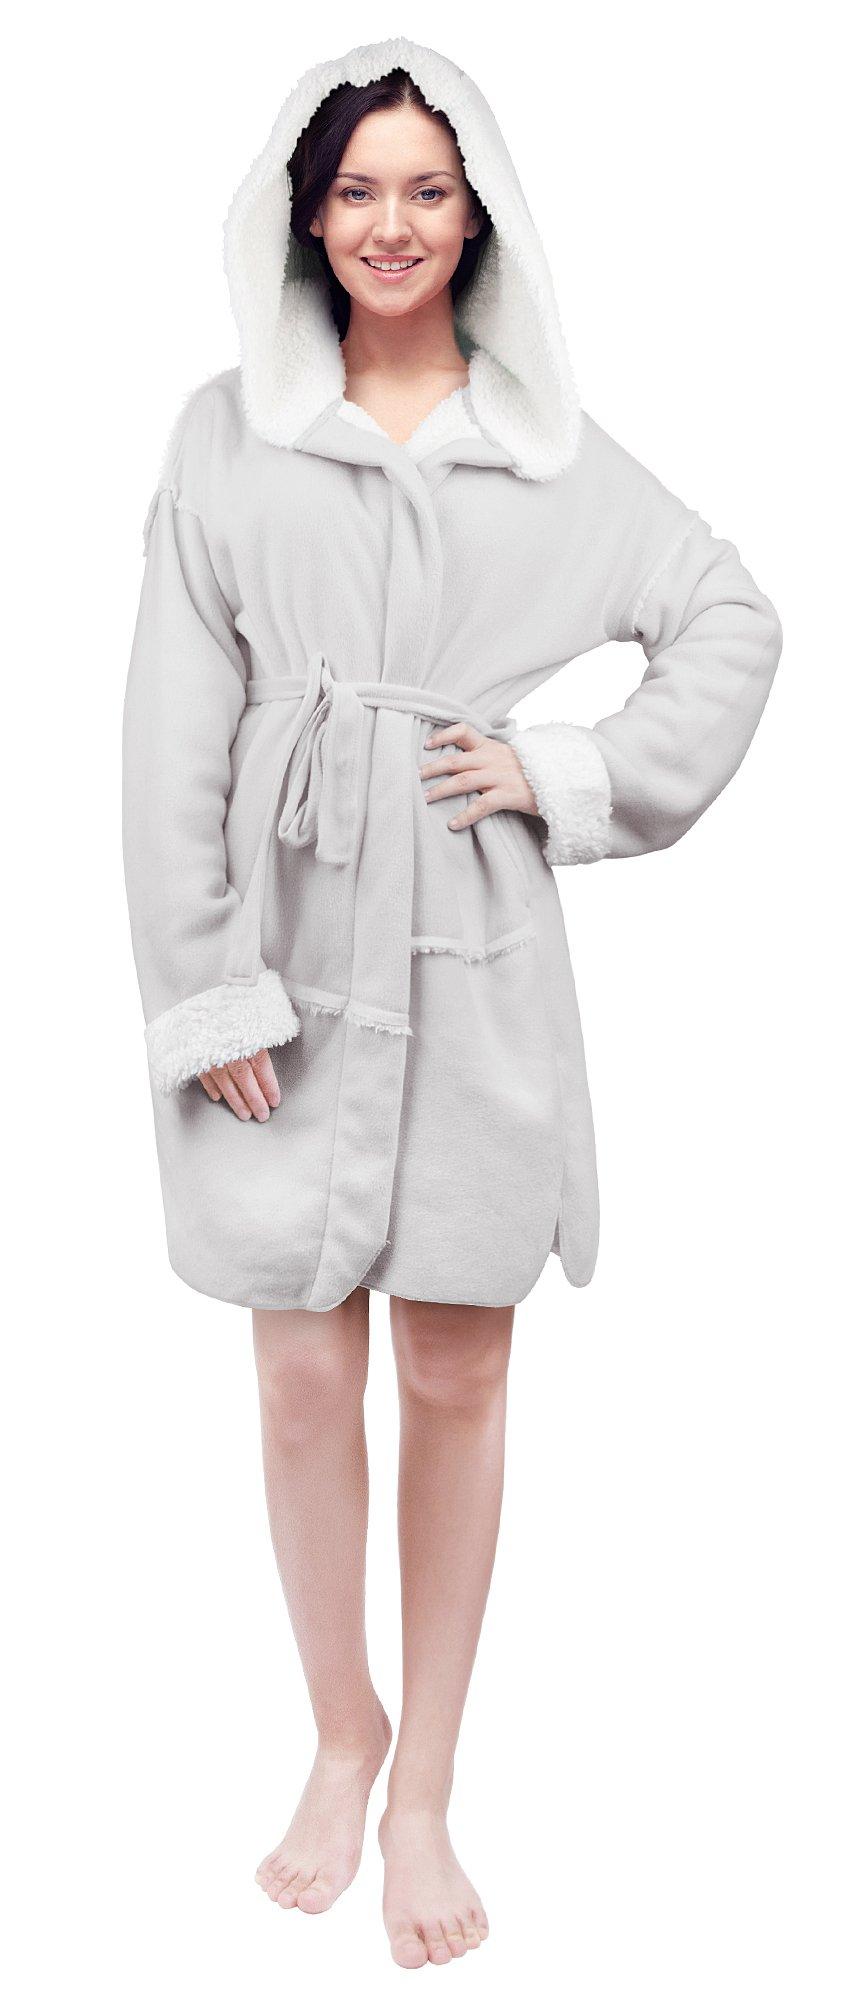 Tirrinia Womens Short Sherpa Robe Plush Hooded Bathrobe With Pockets Pajama Gey